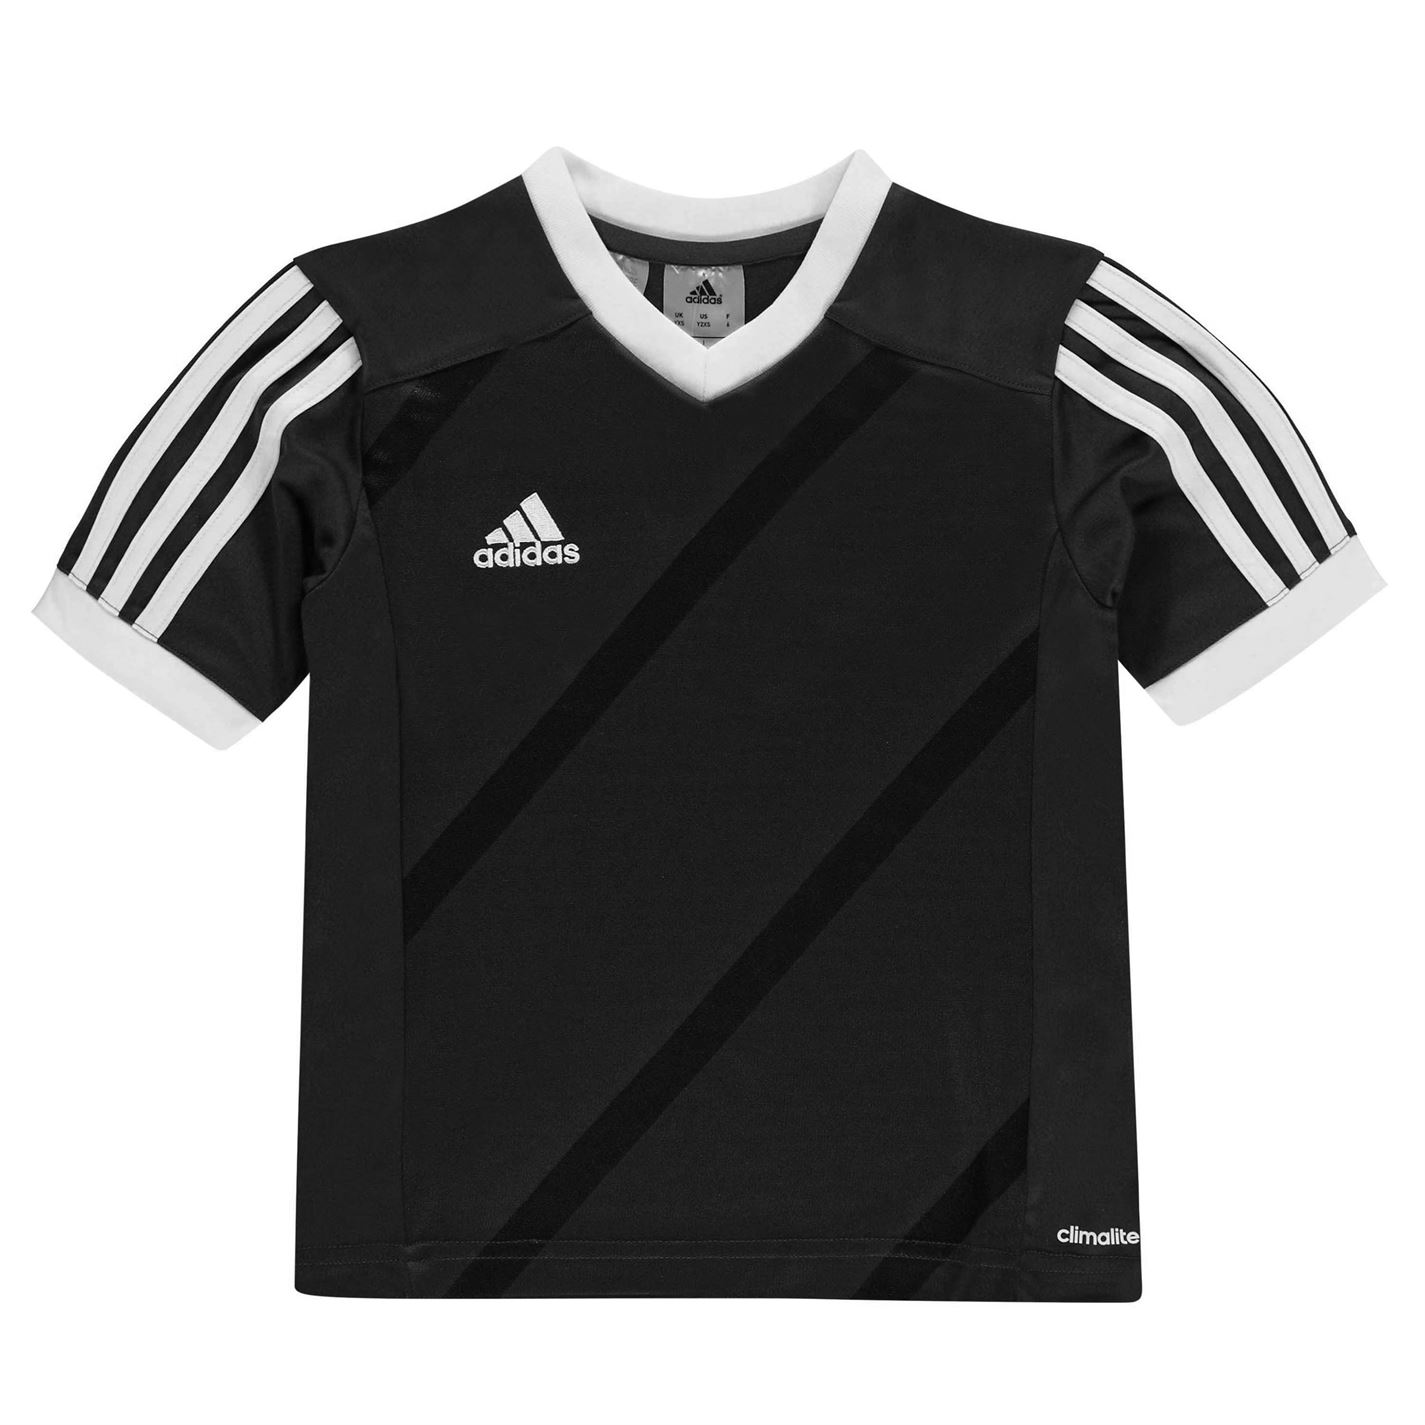 9a7cfc5396e4 dětské tričko ADIDAS - BLACK WHITE - 13 let